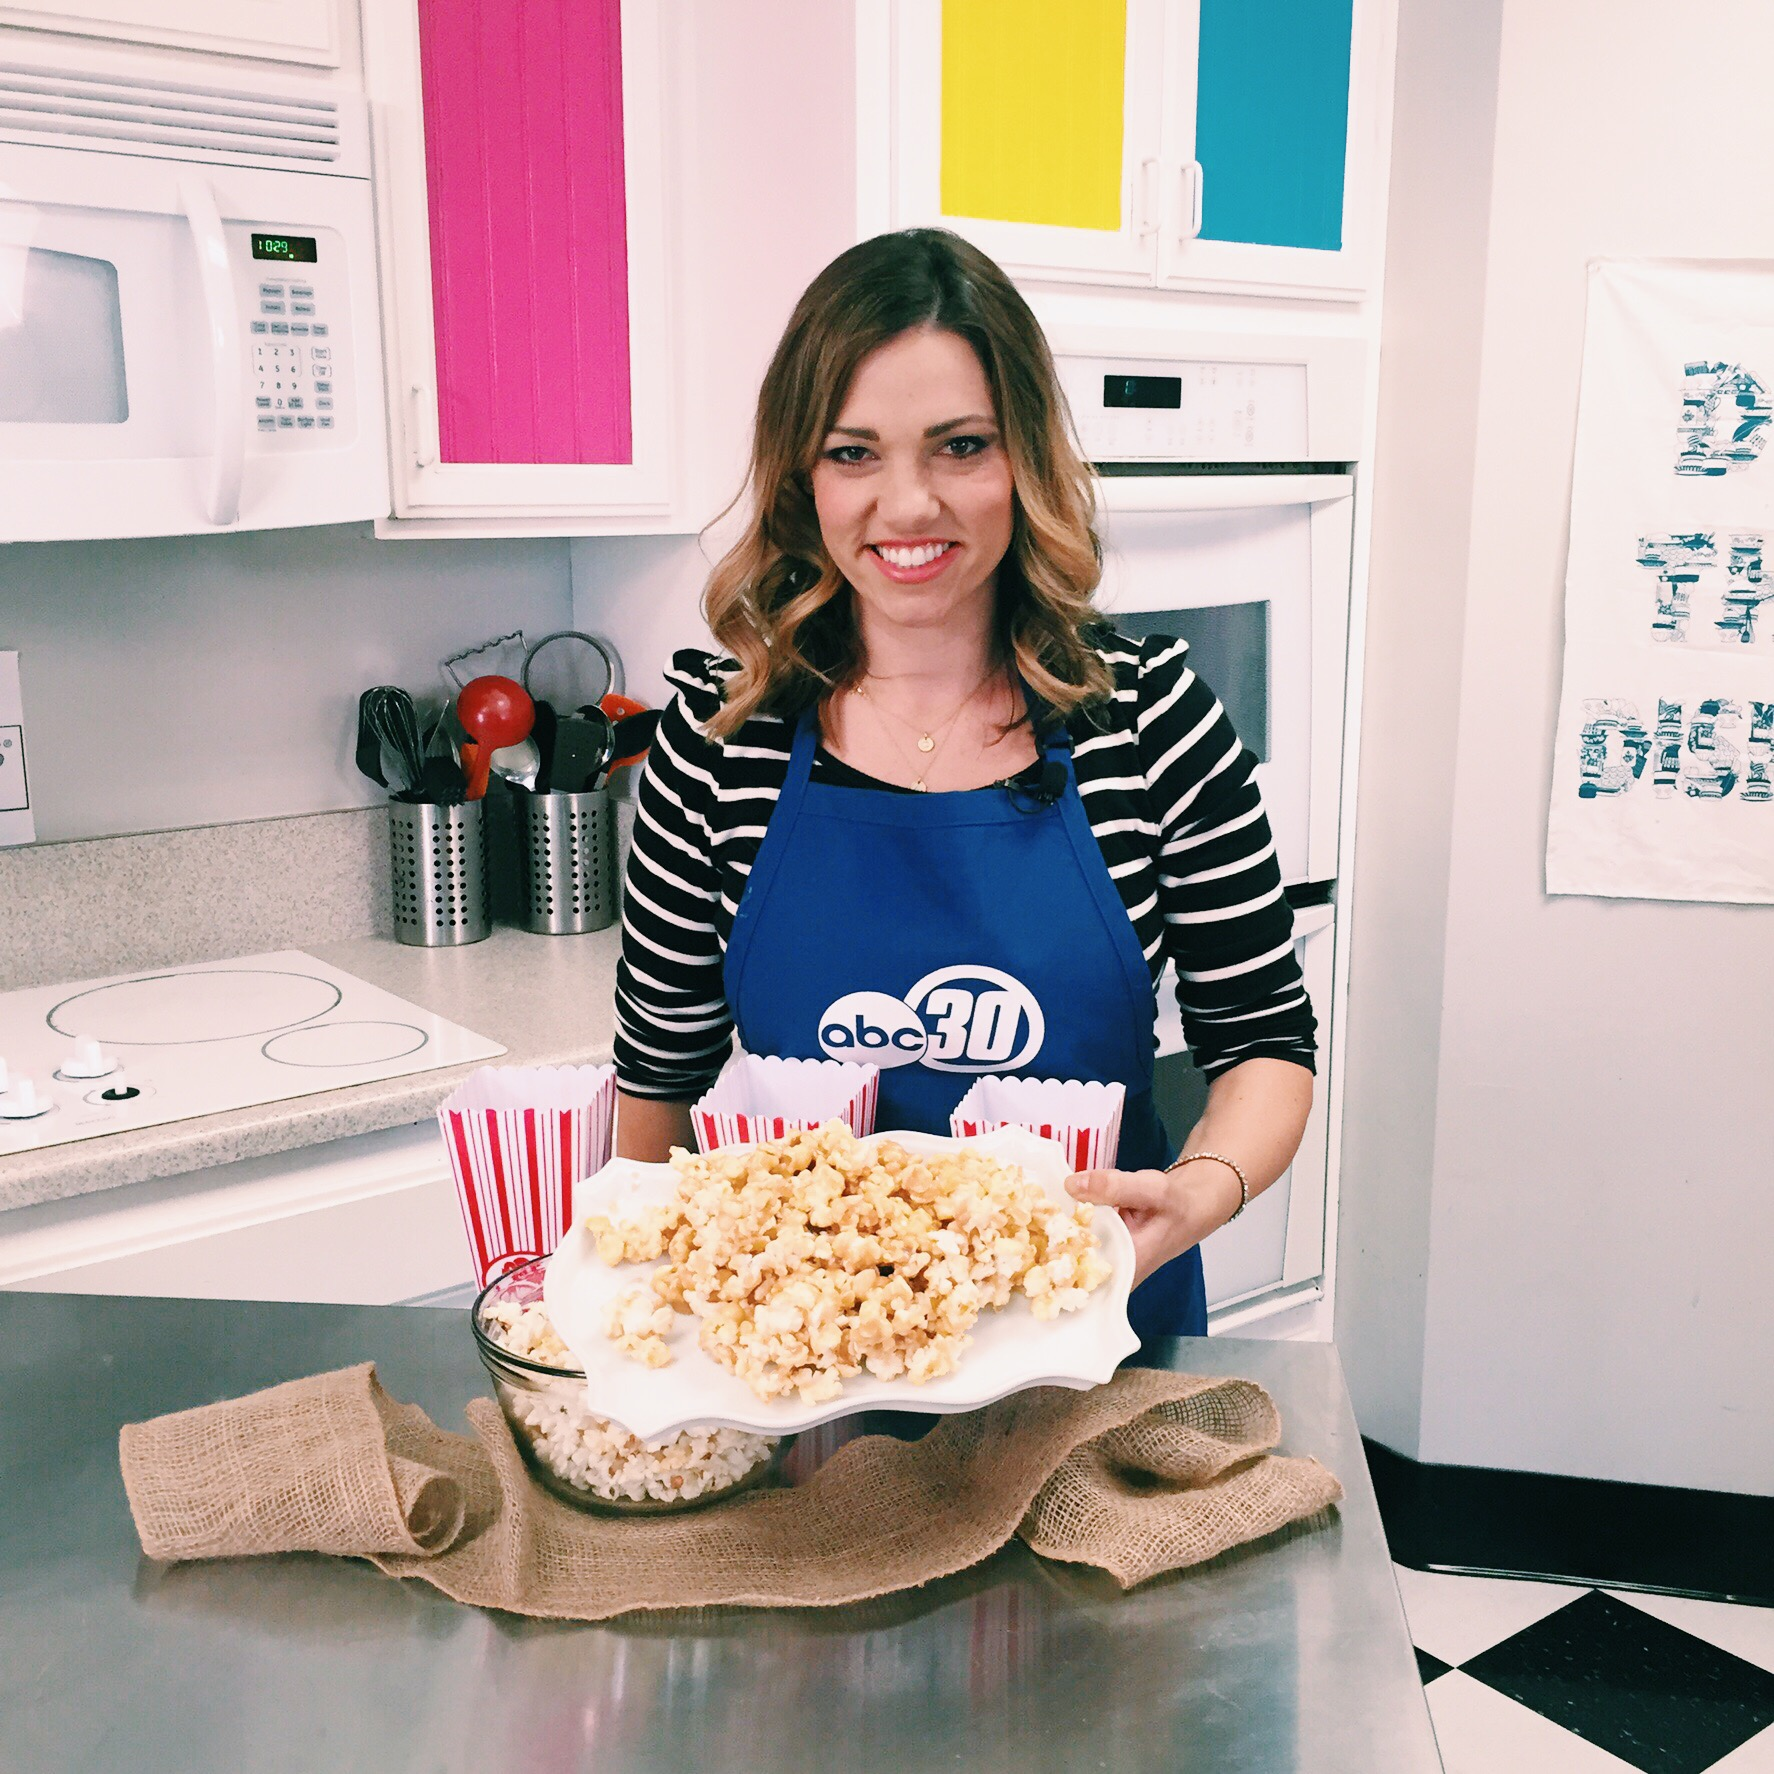 The best Caramel Corn recipe featured on ABC30 - www.ChefShayna.com